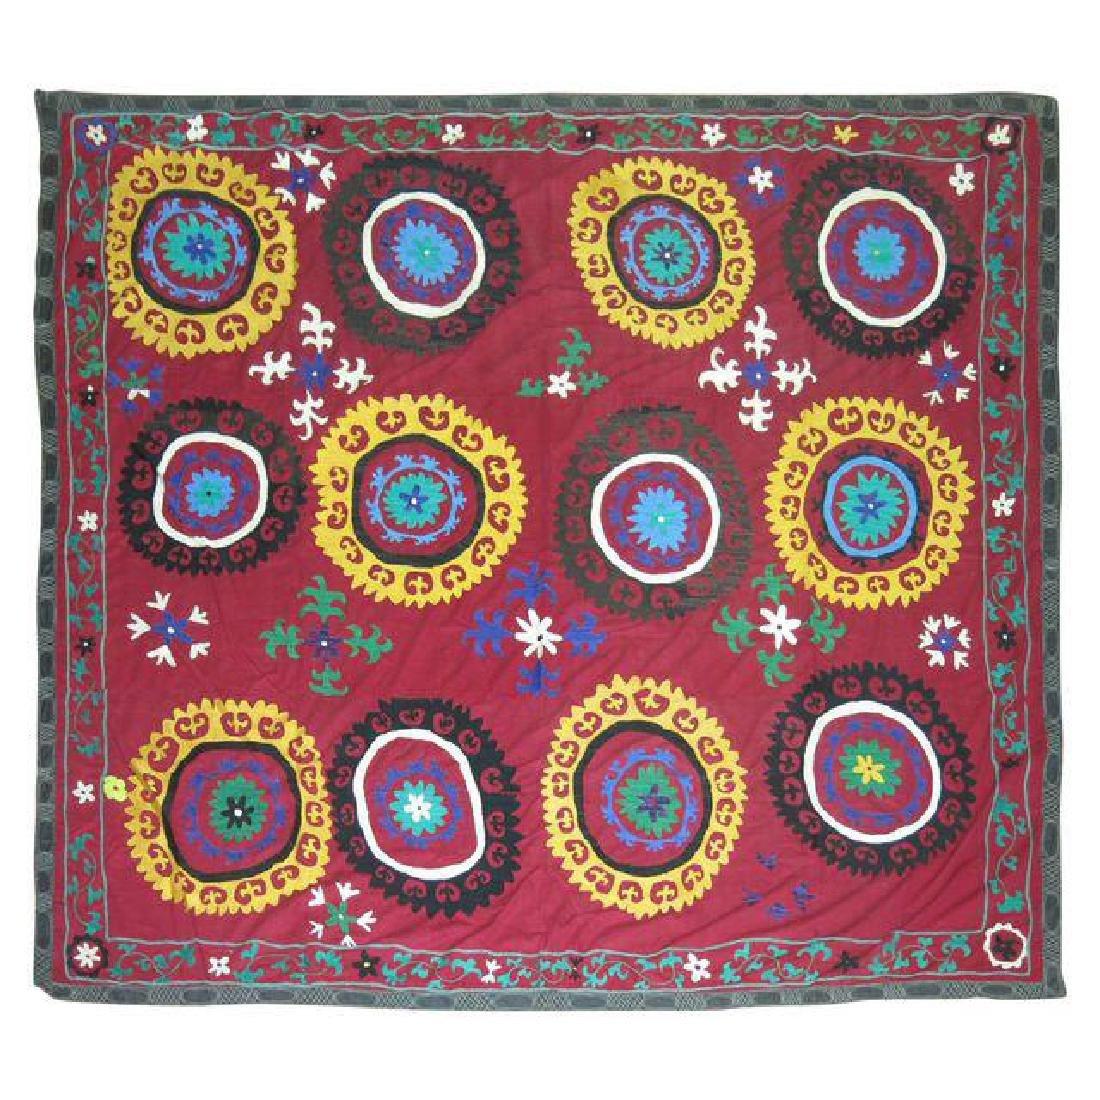 Vintage Suzanni Embroidery Throw 6.10x7.5